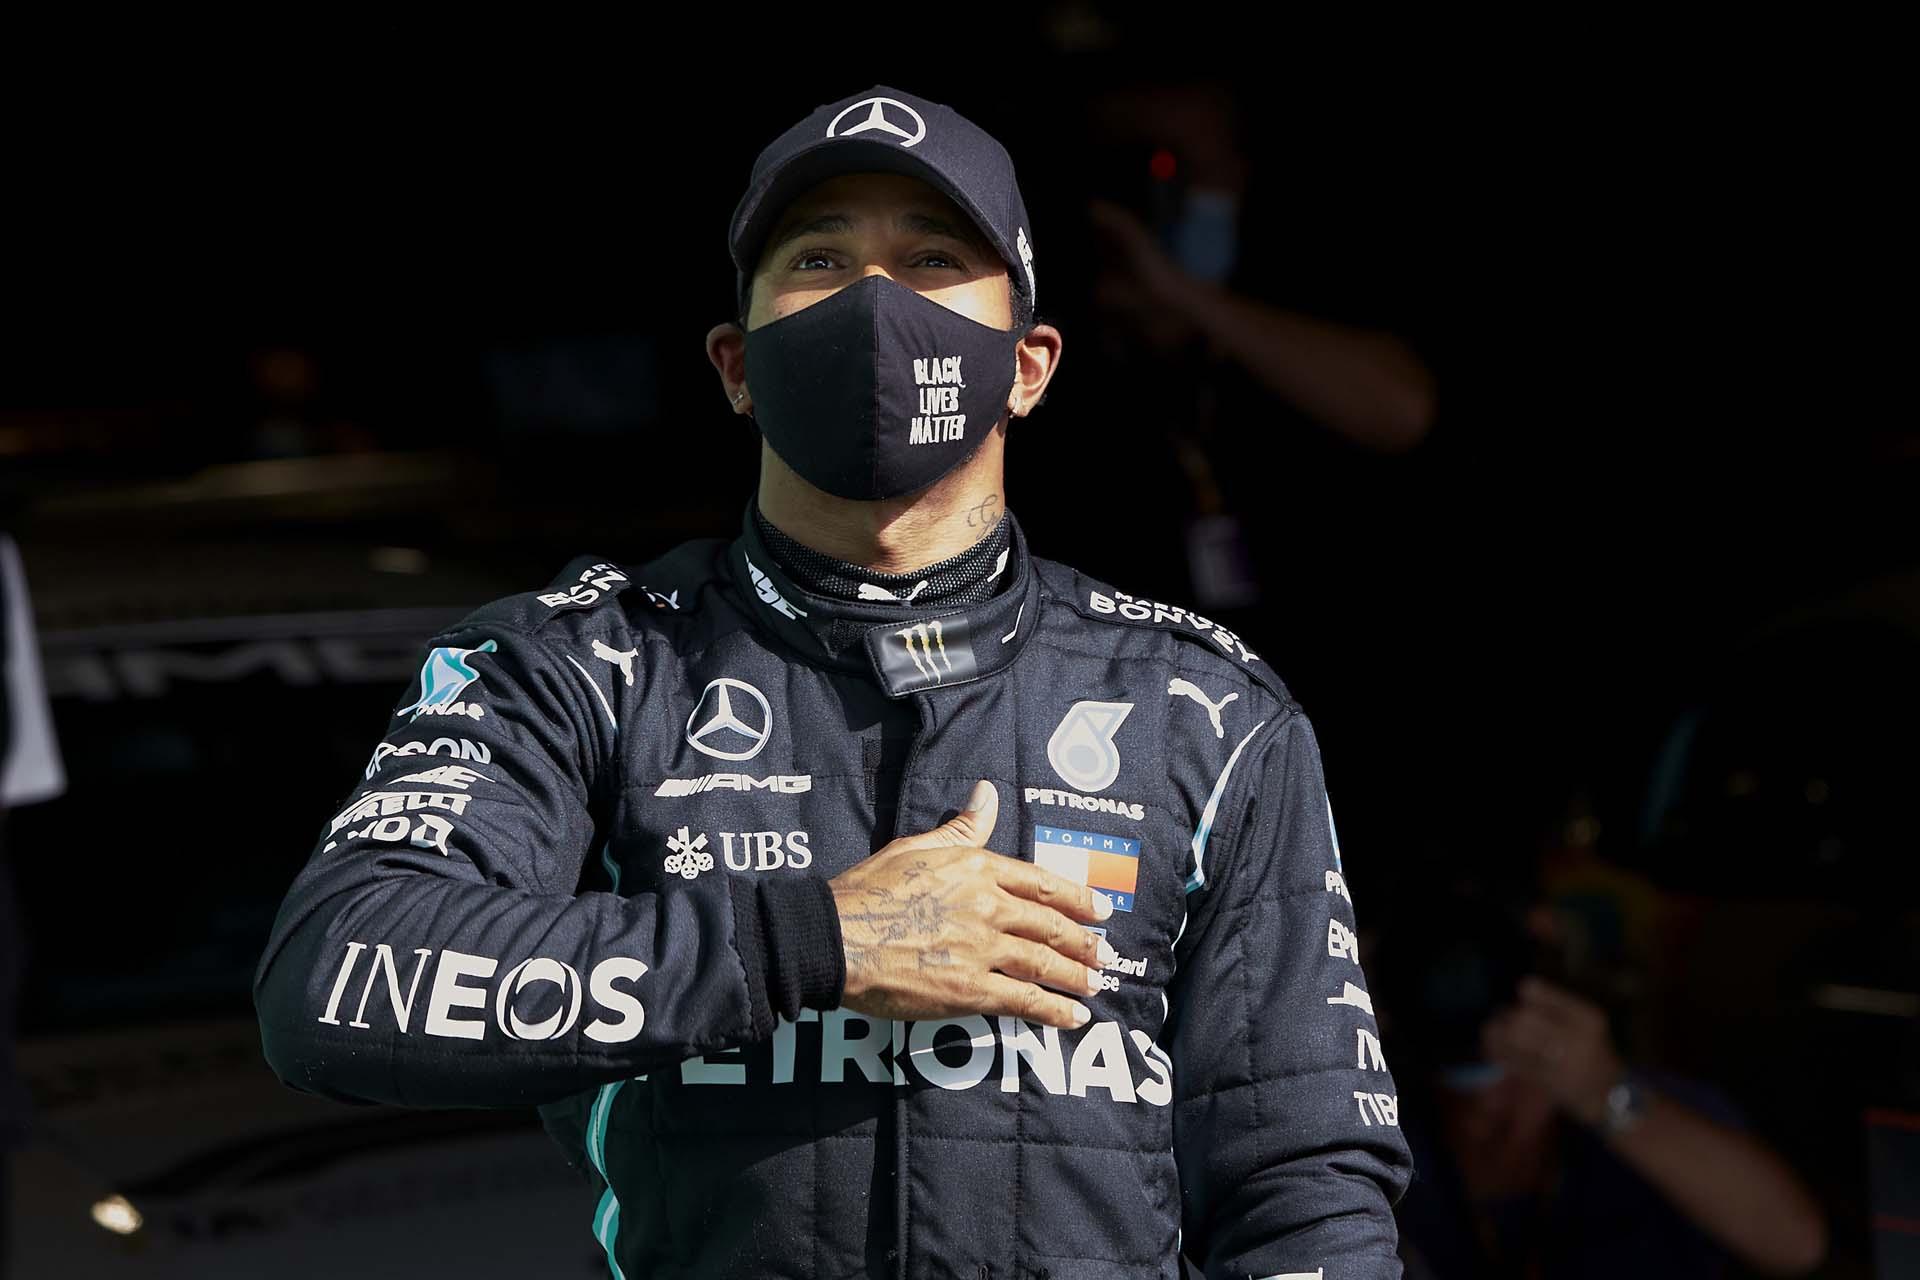 2020 Portuguese Grand Prix, Saturday - Steve Etherington